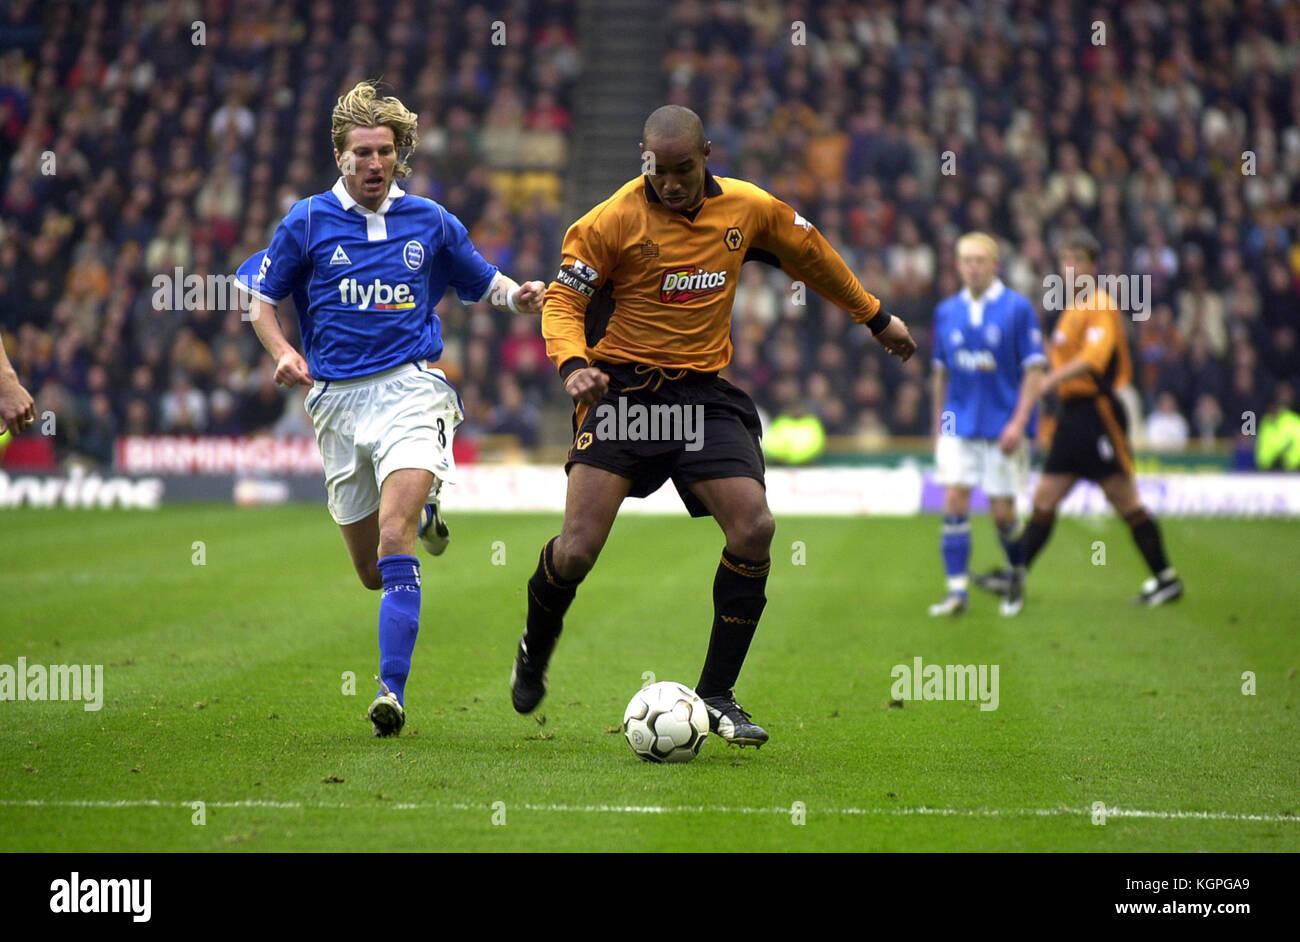 Footballer Paul Ince and Robbie Savage Wolverhampton Wanderers v Birmingham City 08 November 2003 - Stock Image